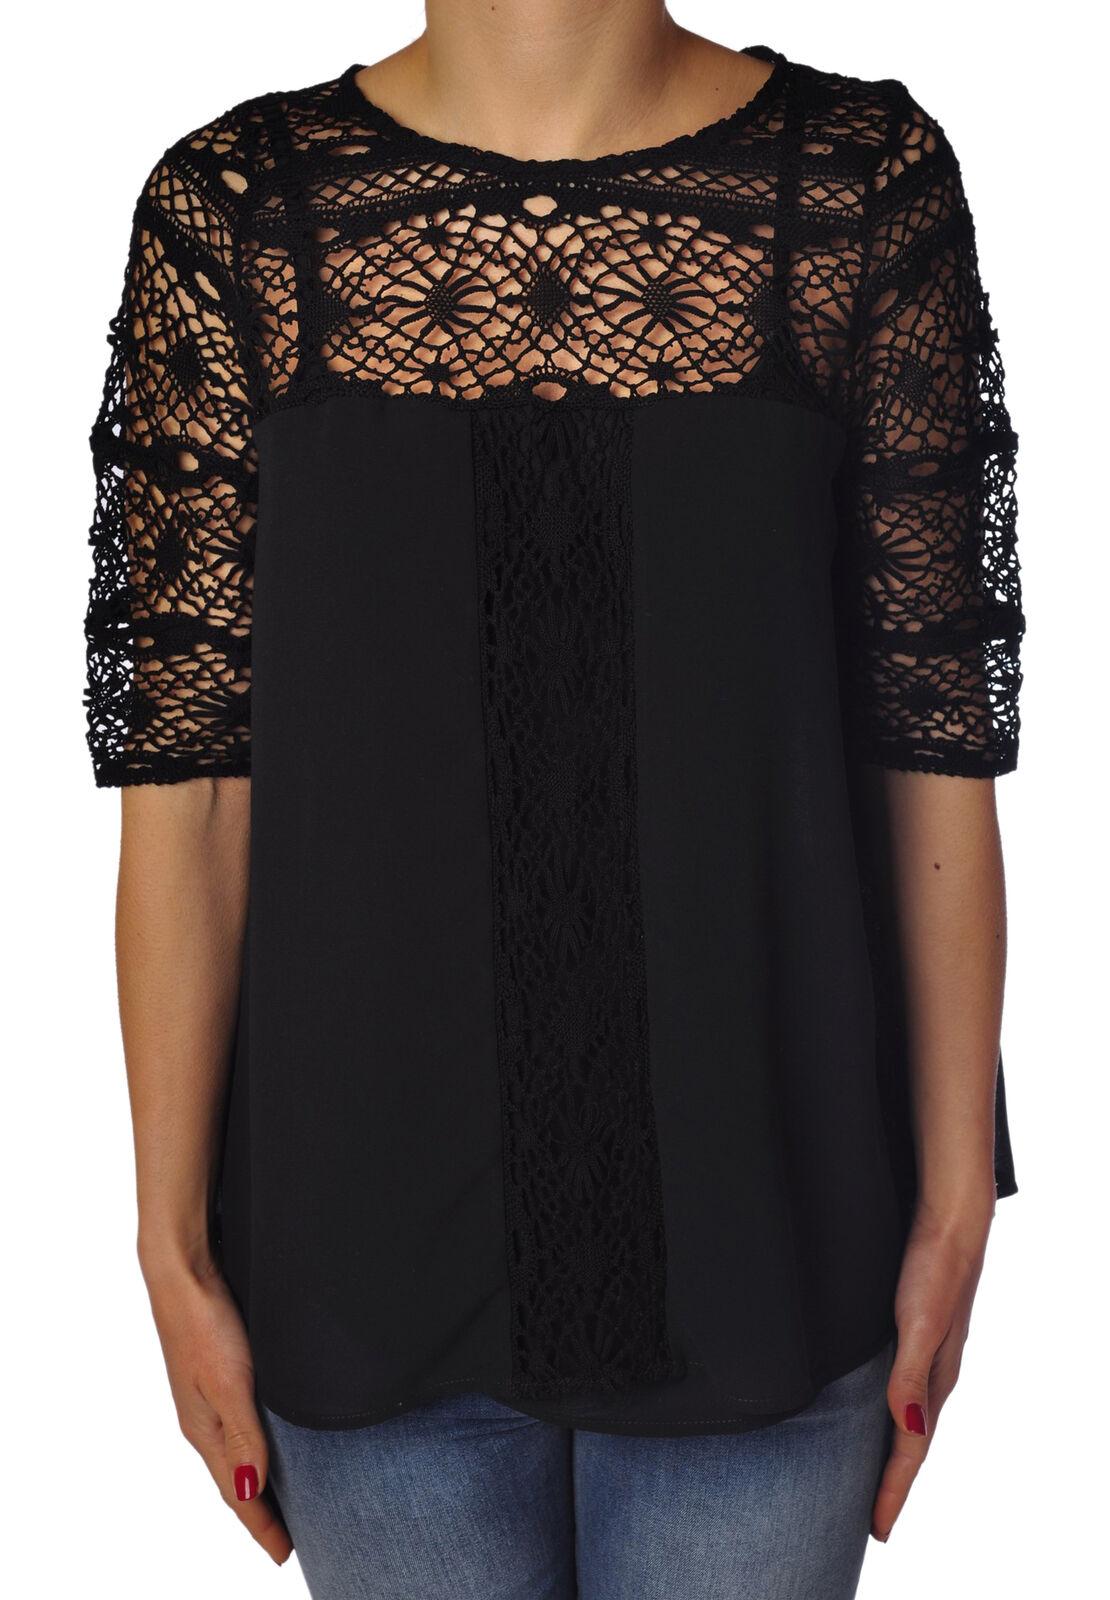 Soallure - Shirts-Blouses - woman - schwarz - 769517C183530